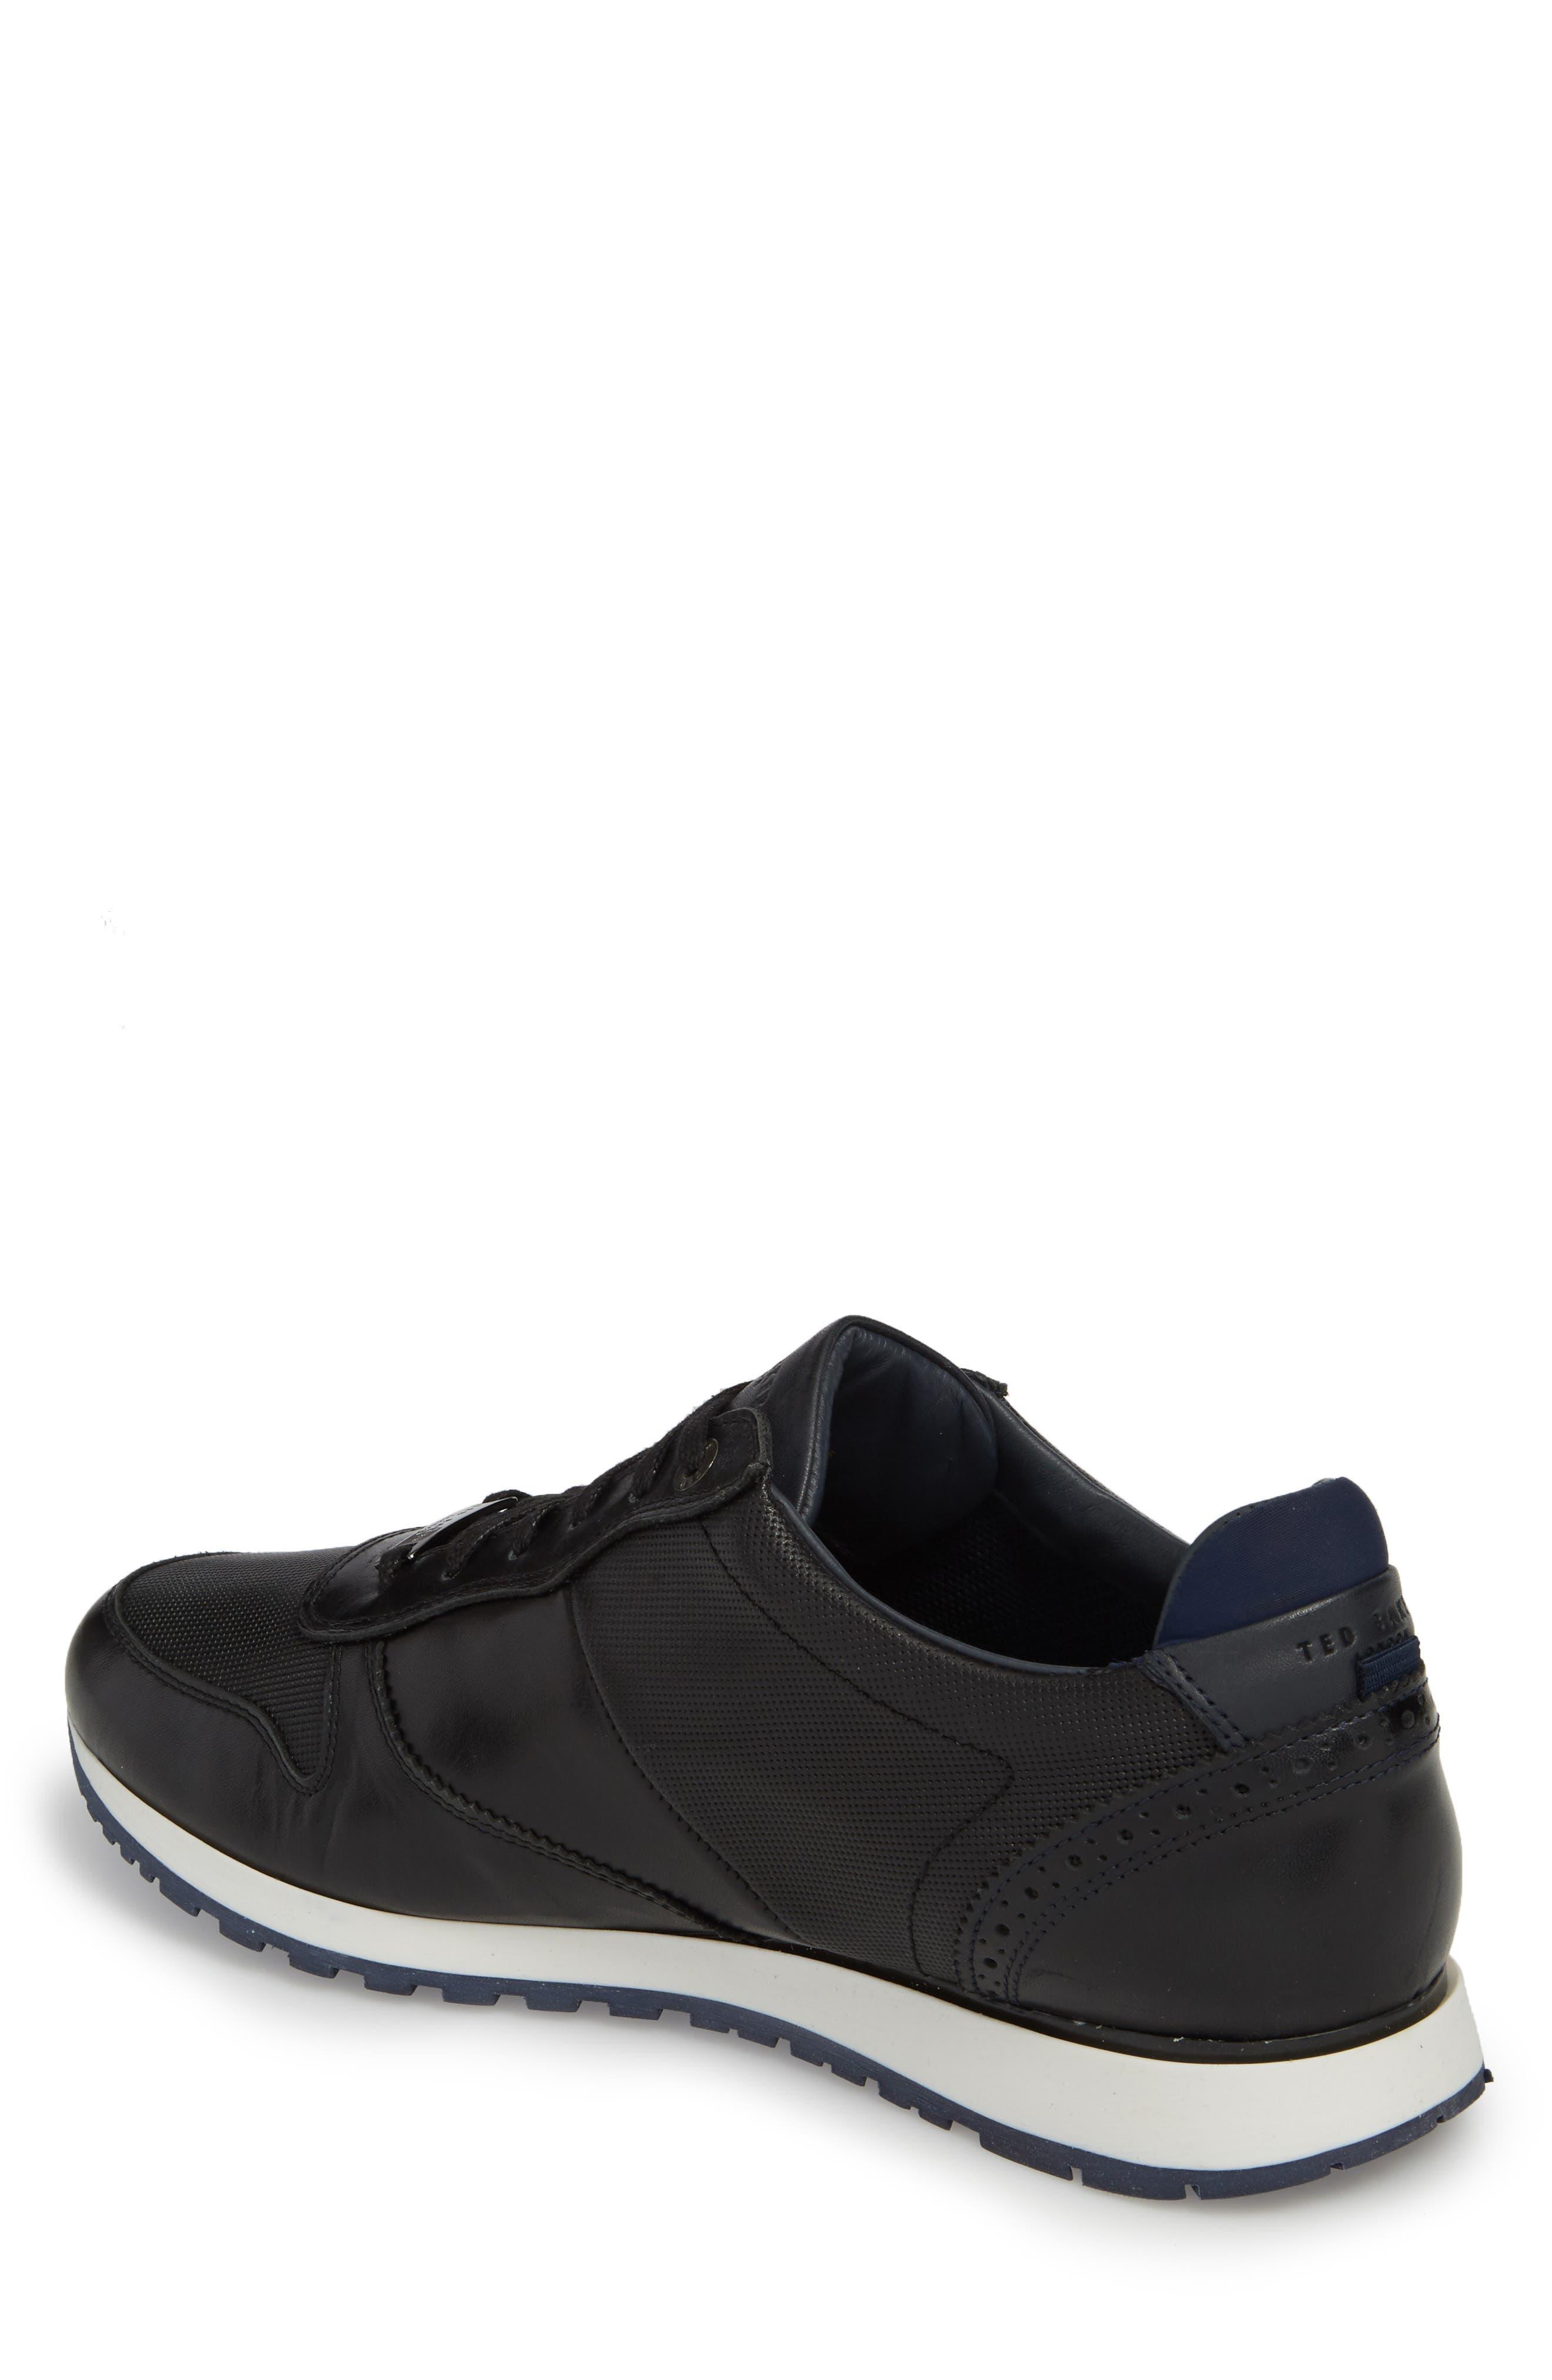 Shindl Sneaker,                             Alternate thumbnail 2, color,                             001